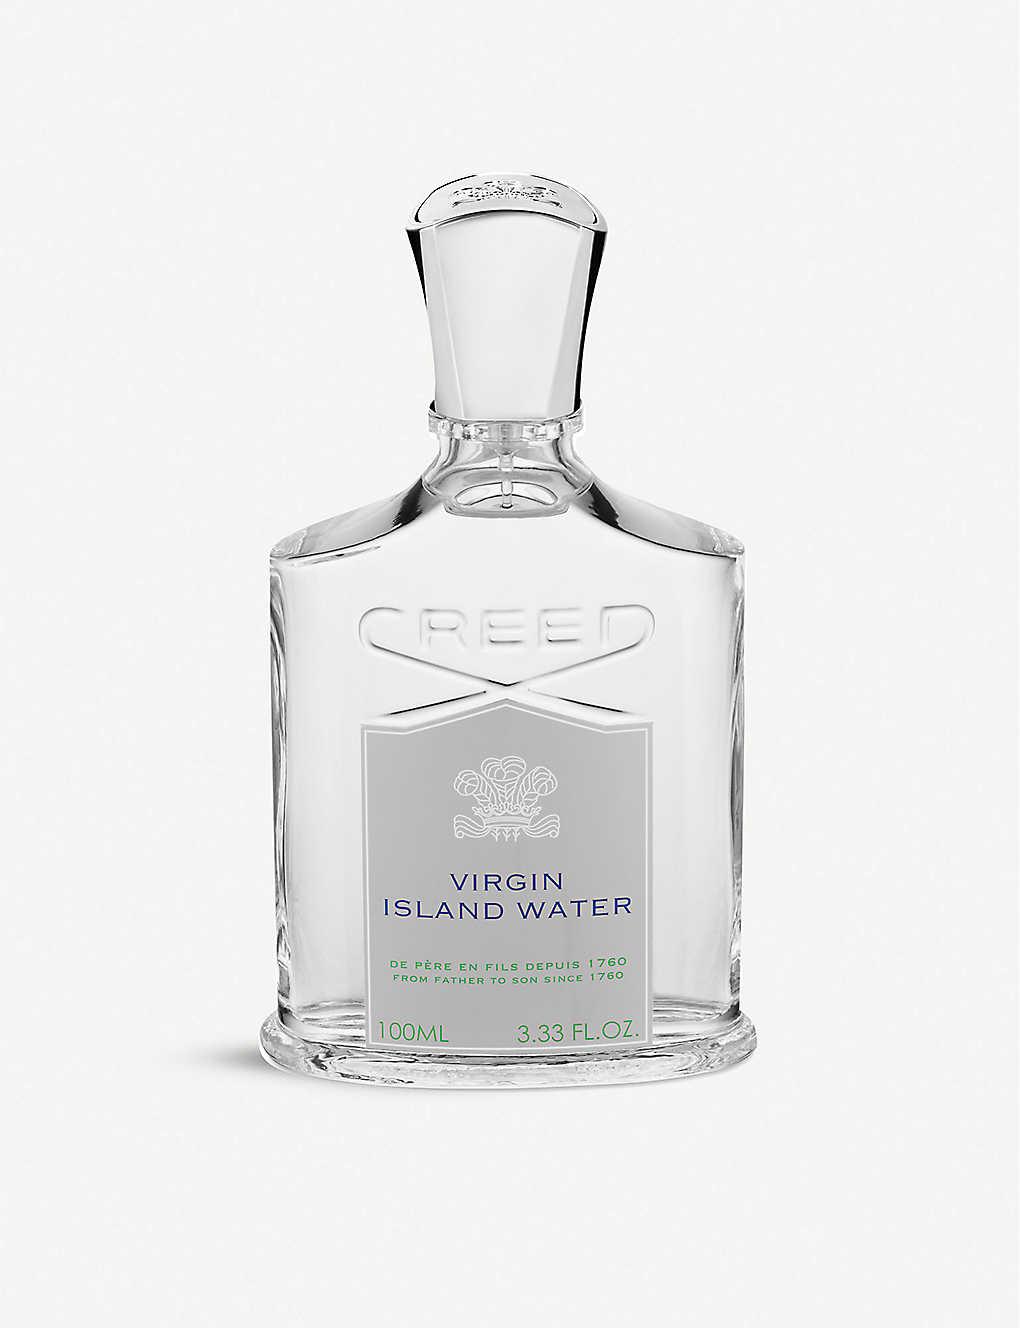 Creed Virgin Island Water Eau De Parfum 100ml Selfridgescom